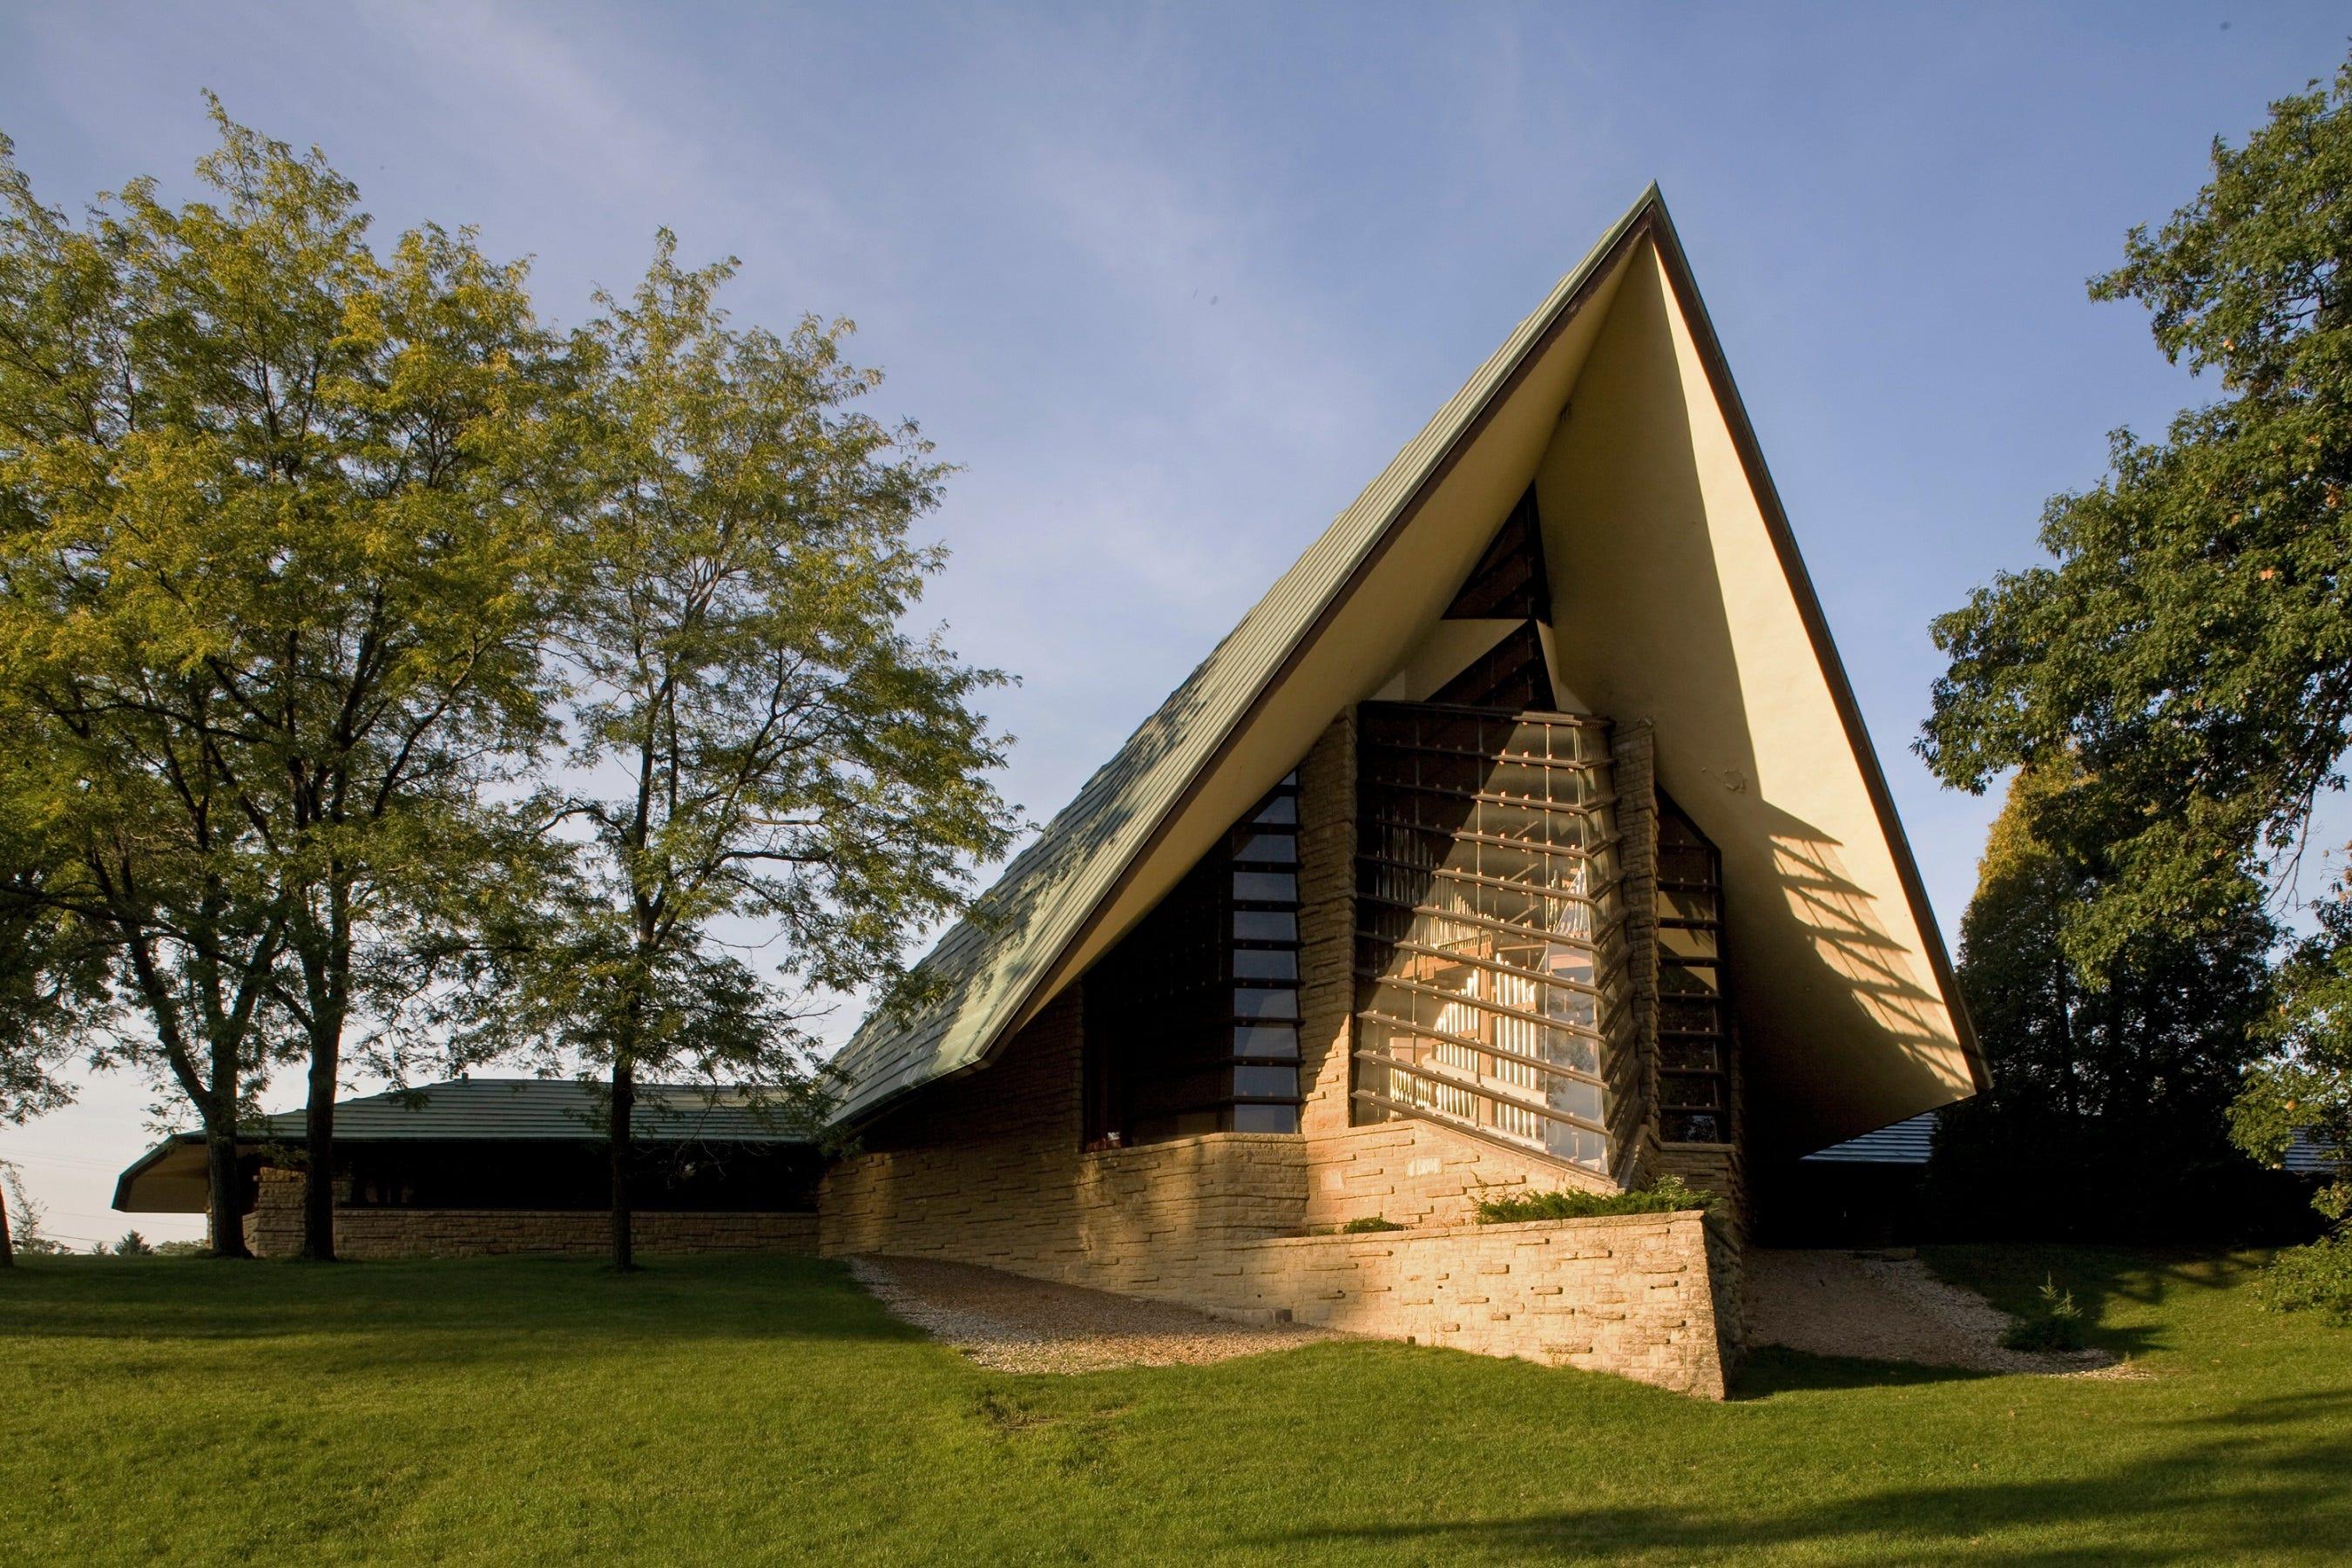 taliesin fellow architect share insights on frank lloyd